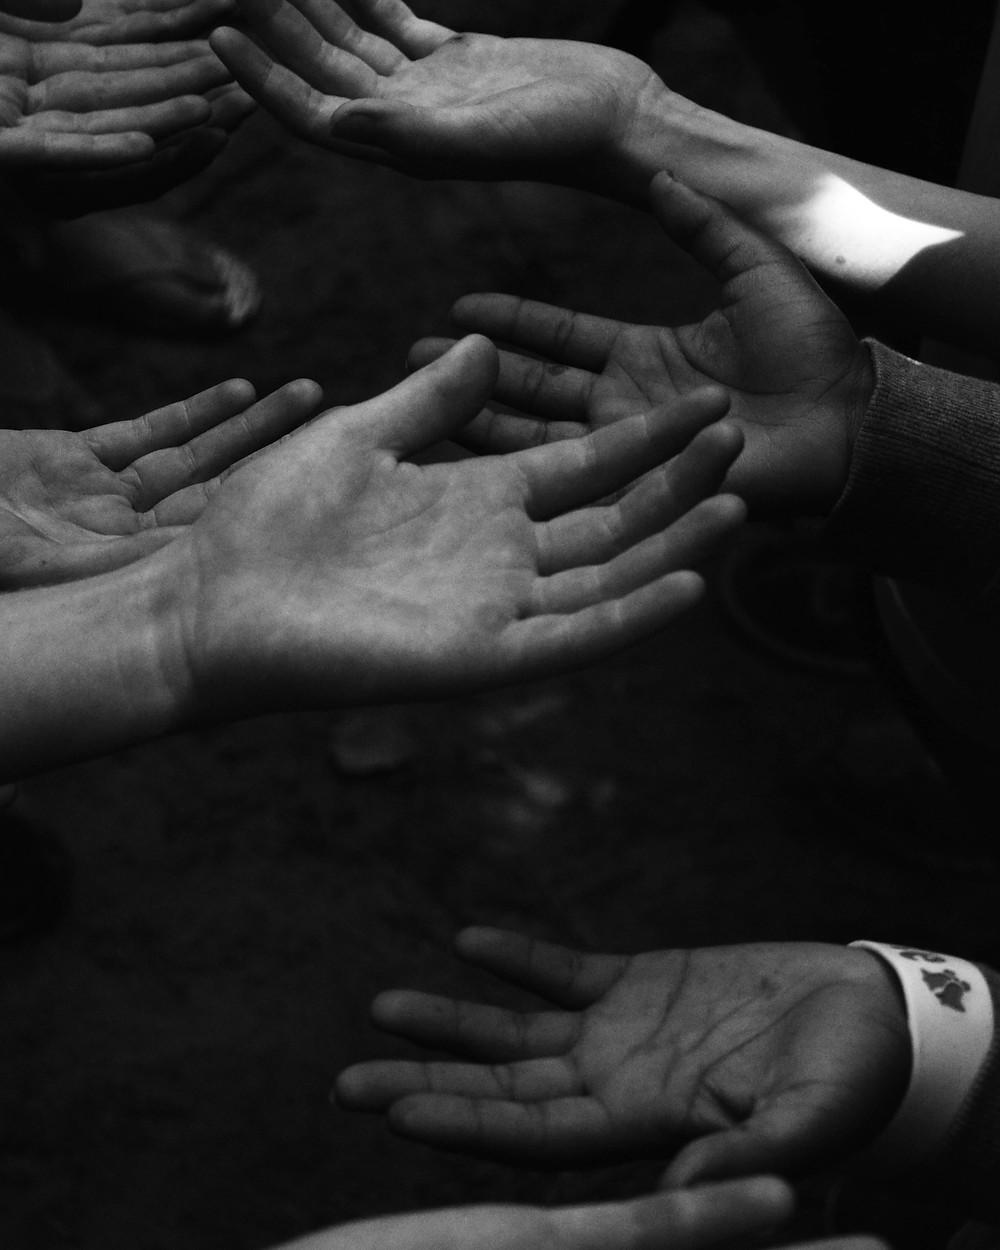 Open hands, empty palms